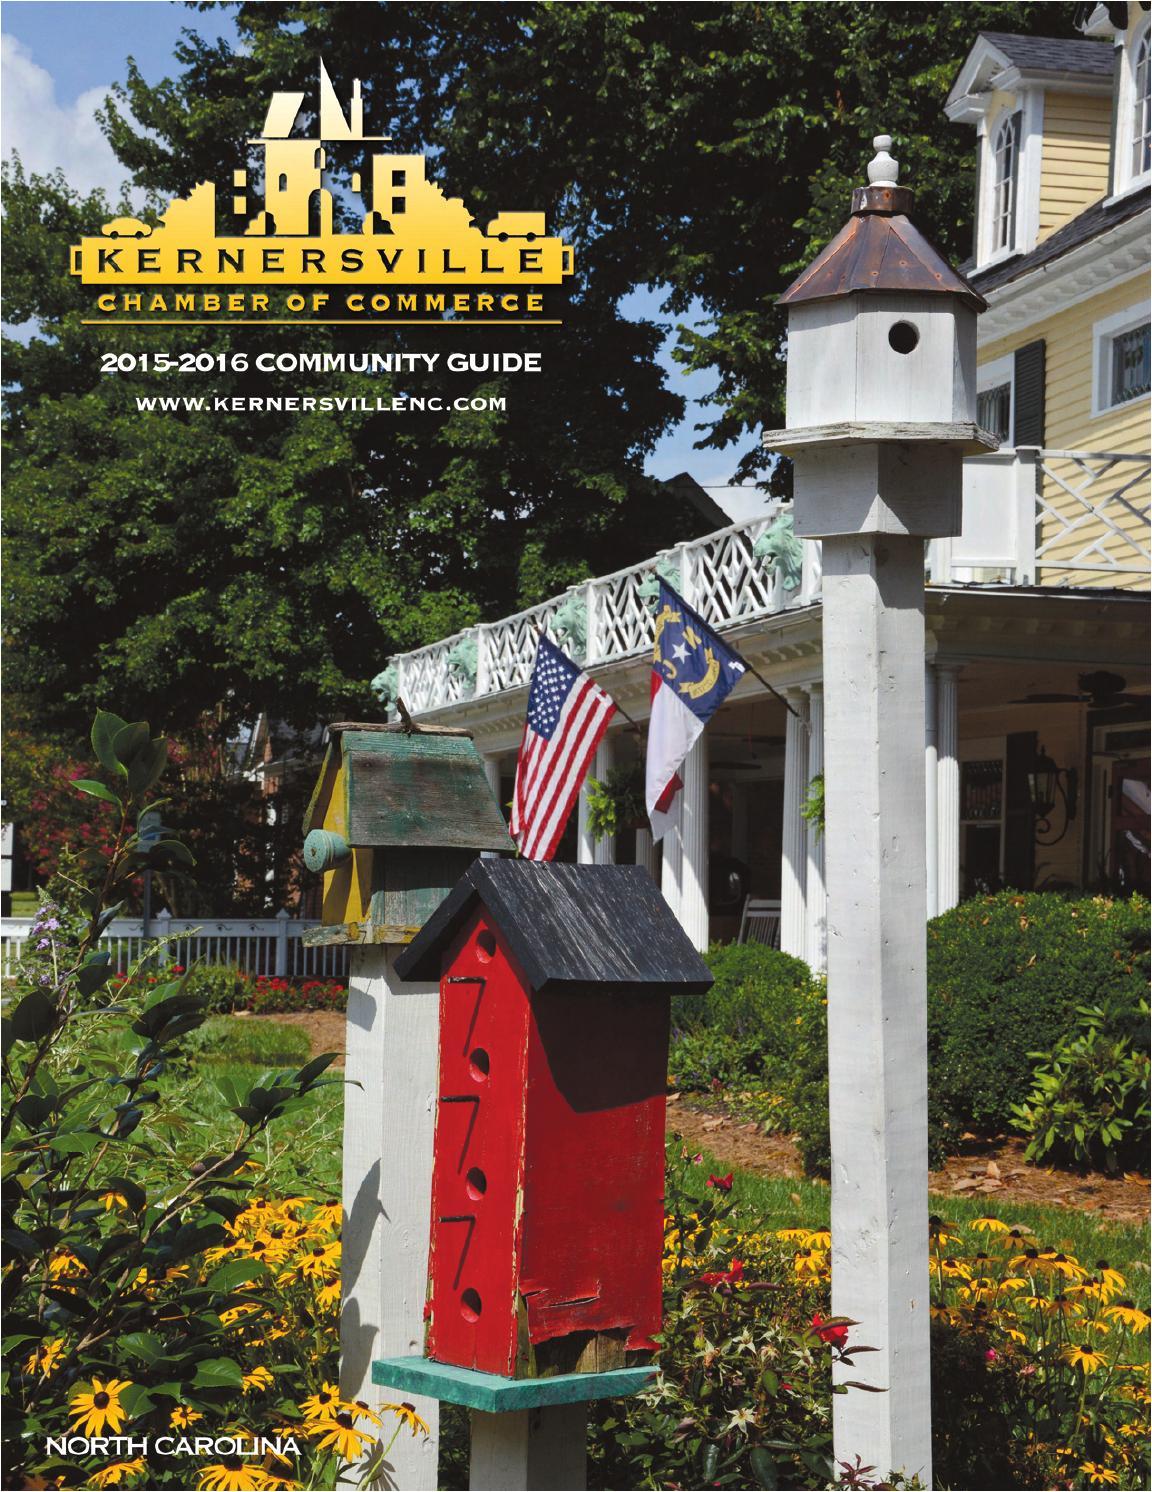 Handyman In Winston Salem Nc Kernersville Nc Community Profile by townsquare Publications Llc